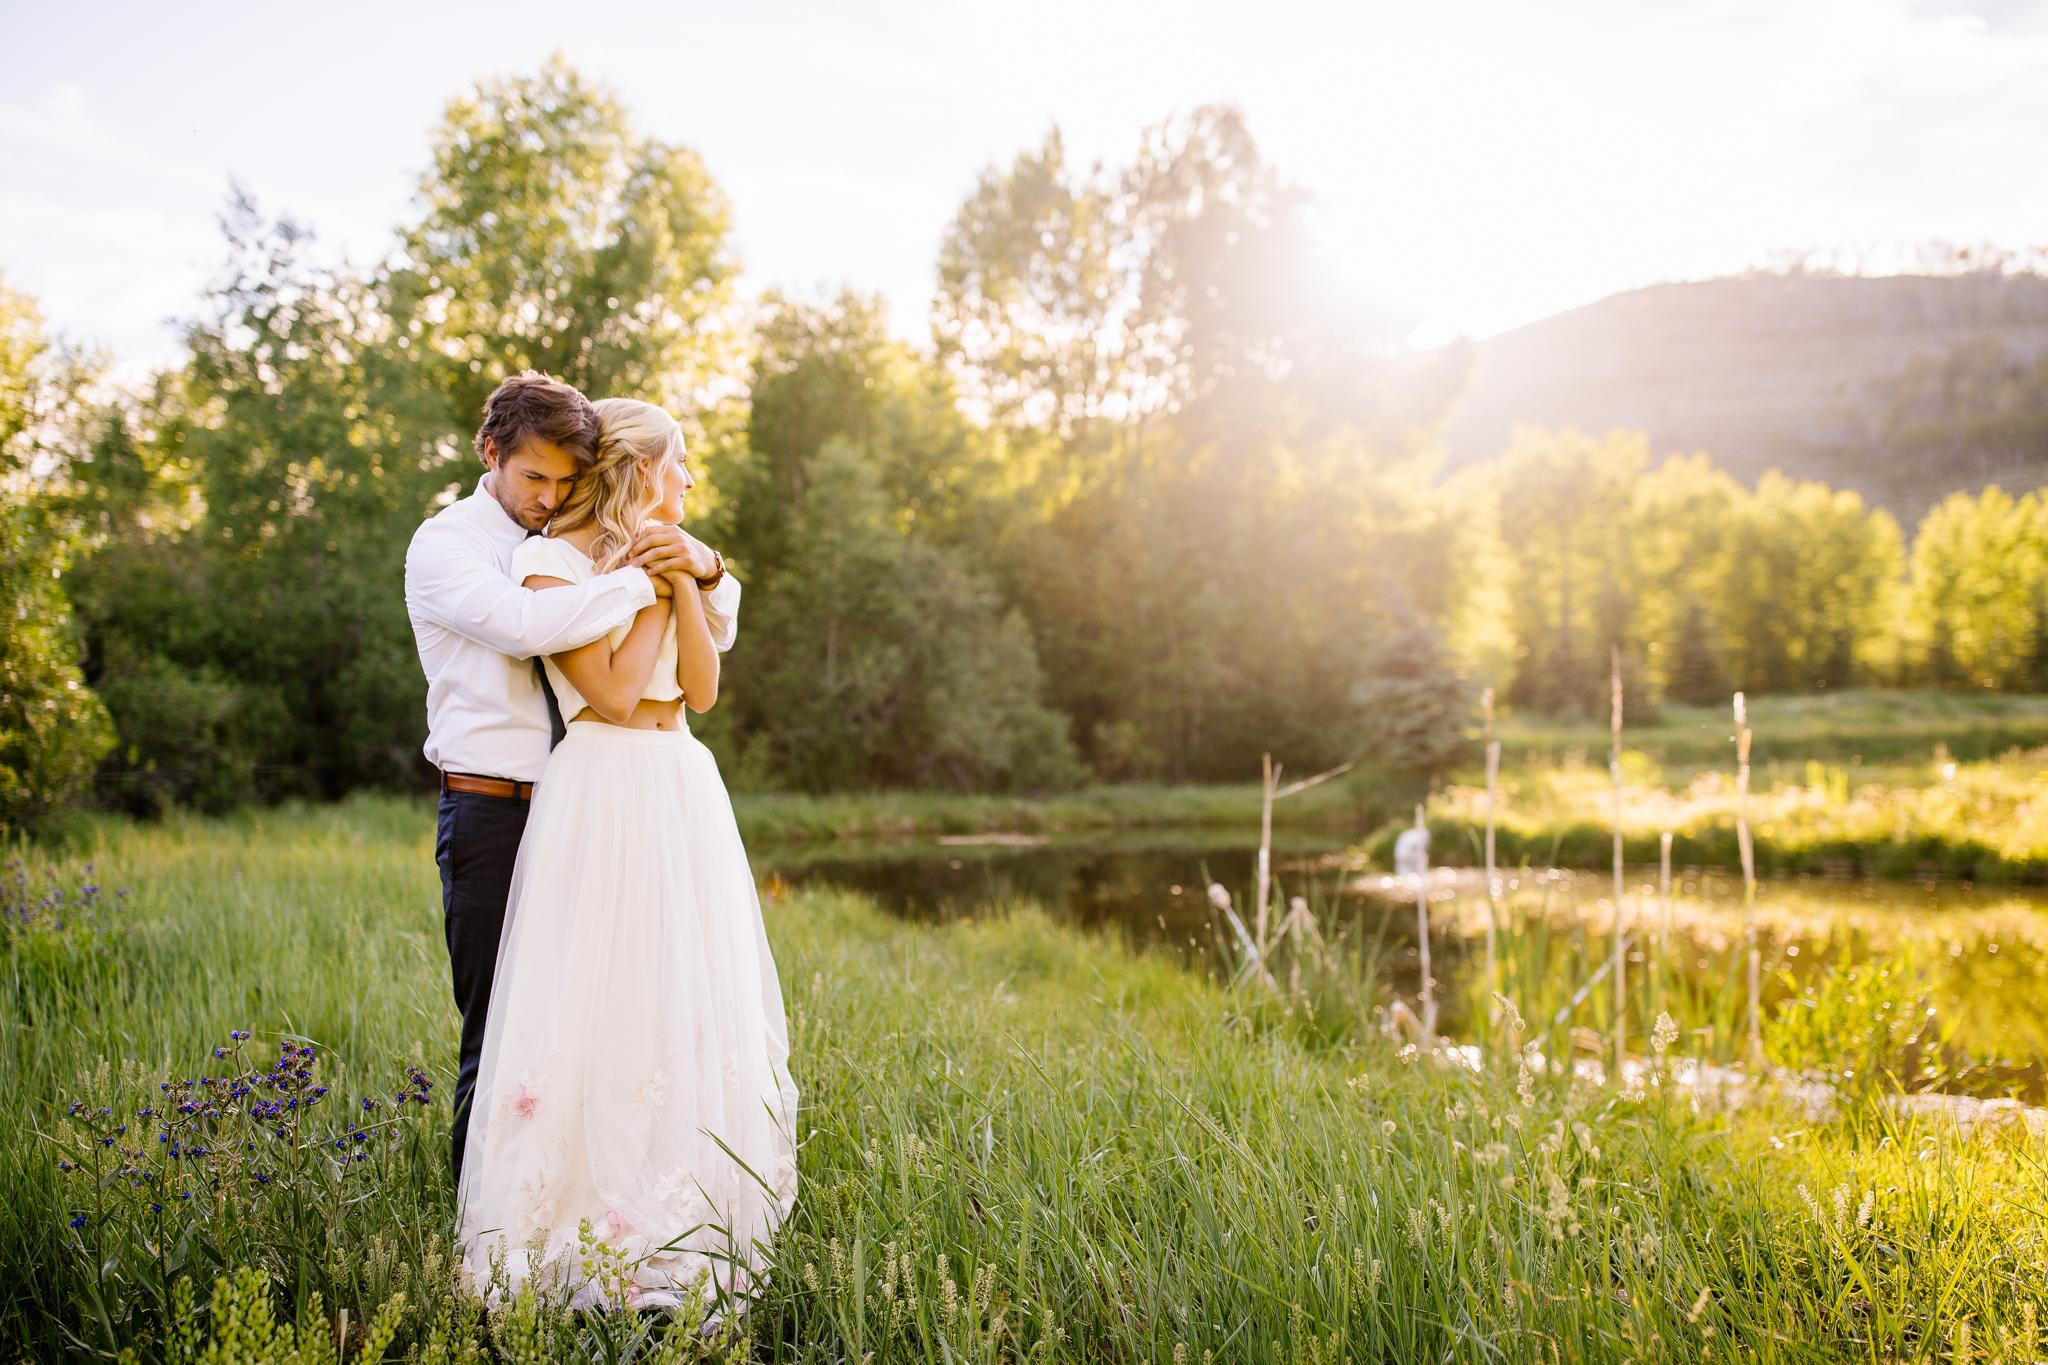 Lizzie-B-Imagery-Utah-Wedding-Photographer-Salt-Lake-City-Park-City-Oakley-1WEB5.jpg